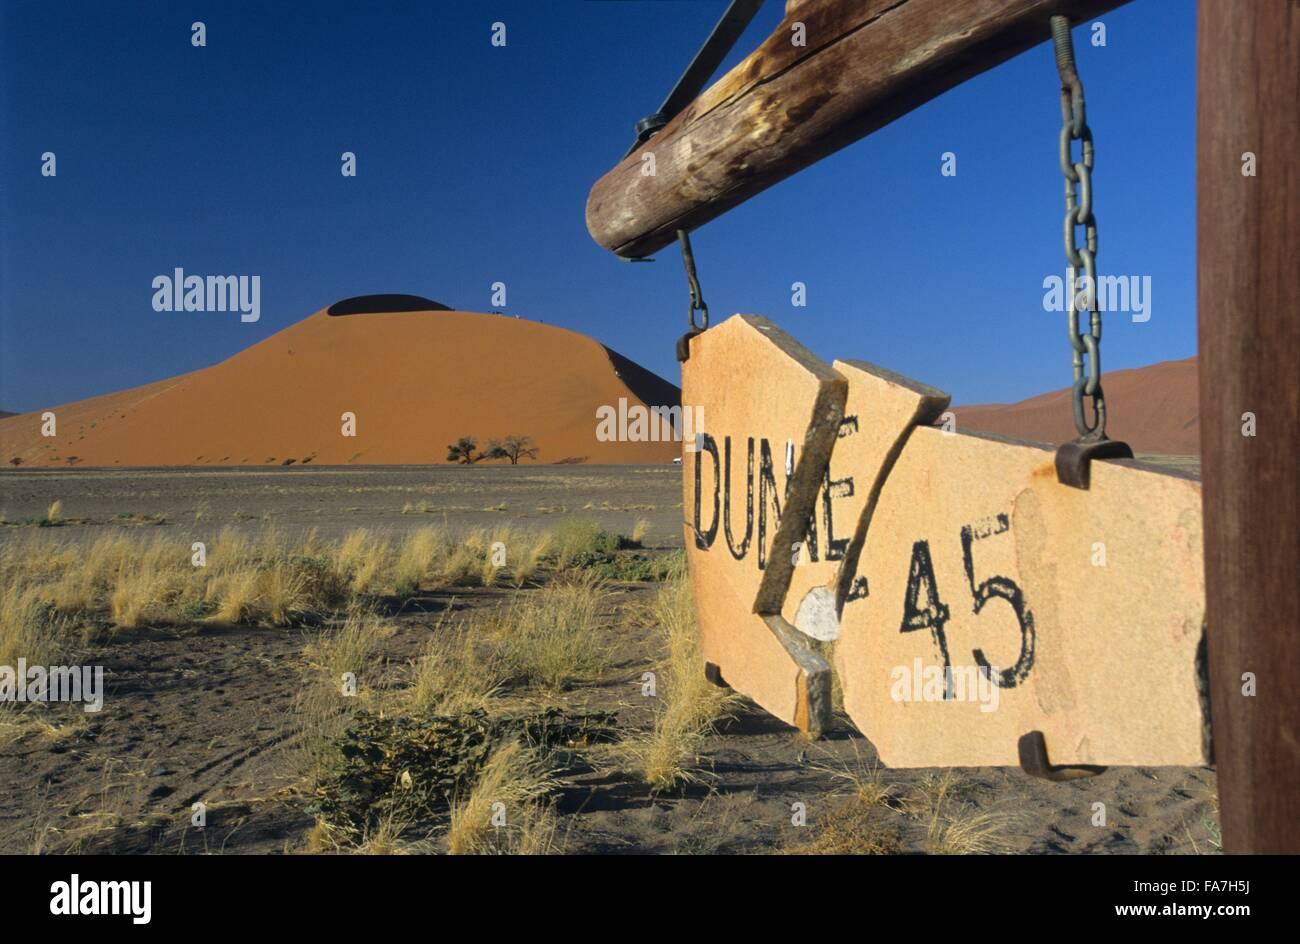 Namibia, Parque Nacional Namib-Naukluft, panel mostrando la famosa Duna 45 // Namibia, Parque Nacional Namib-Naukluft Imagen De Stock